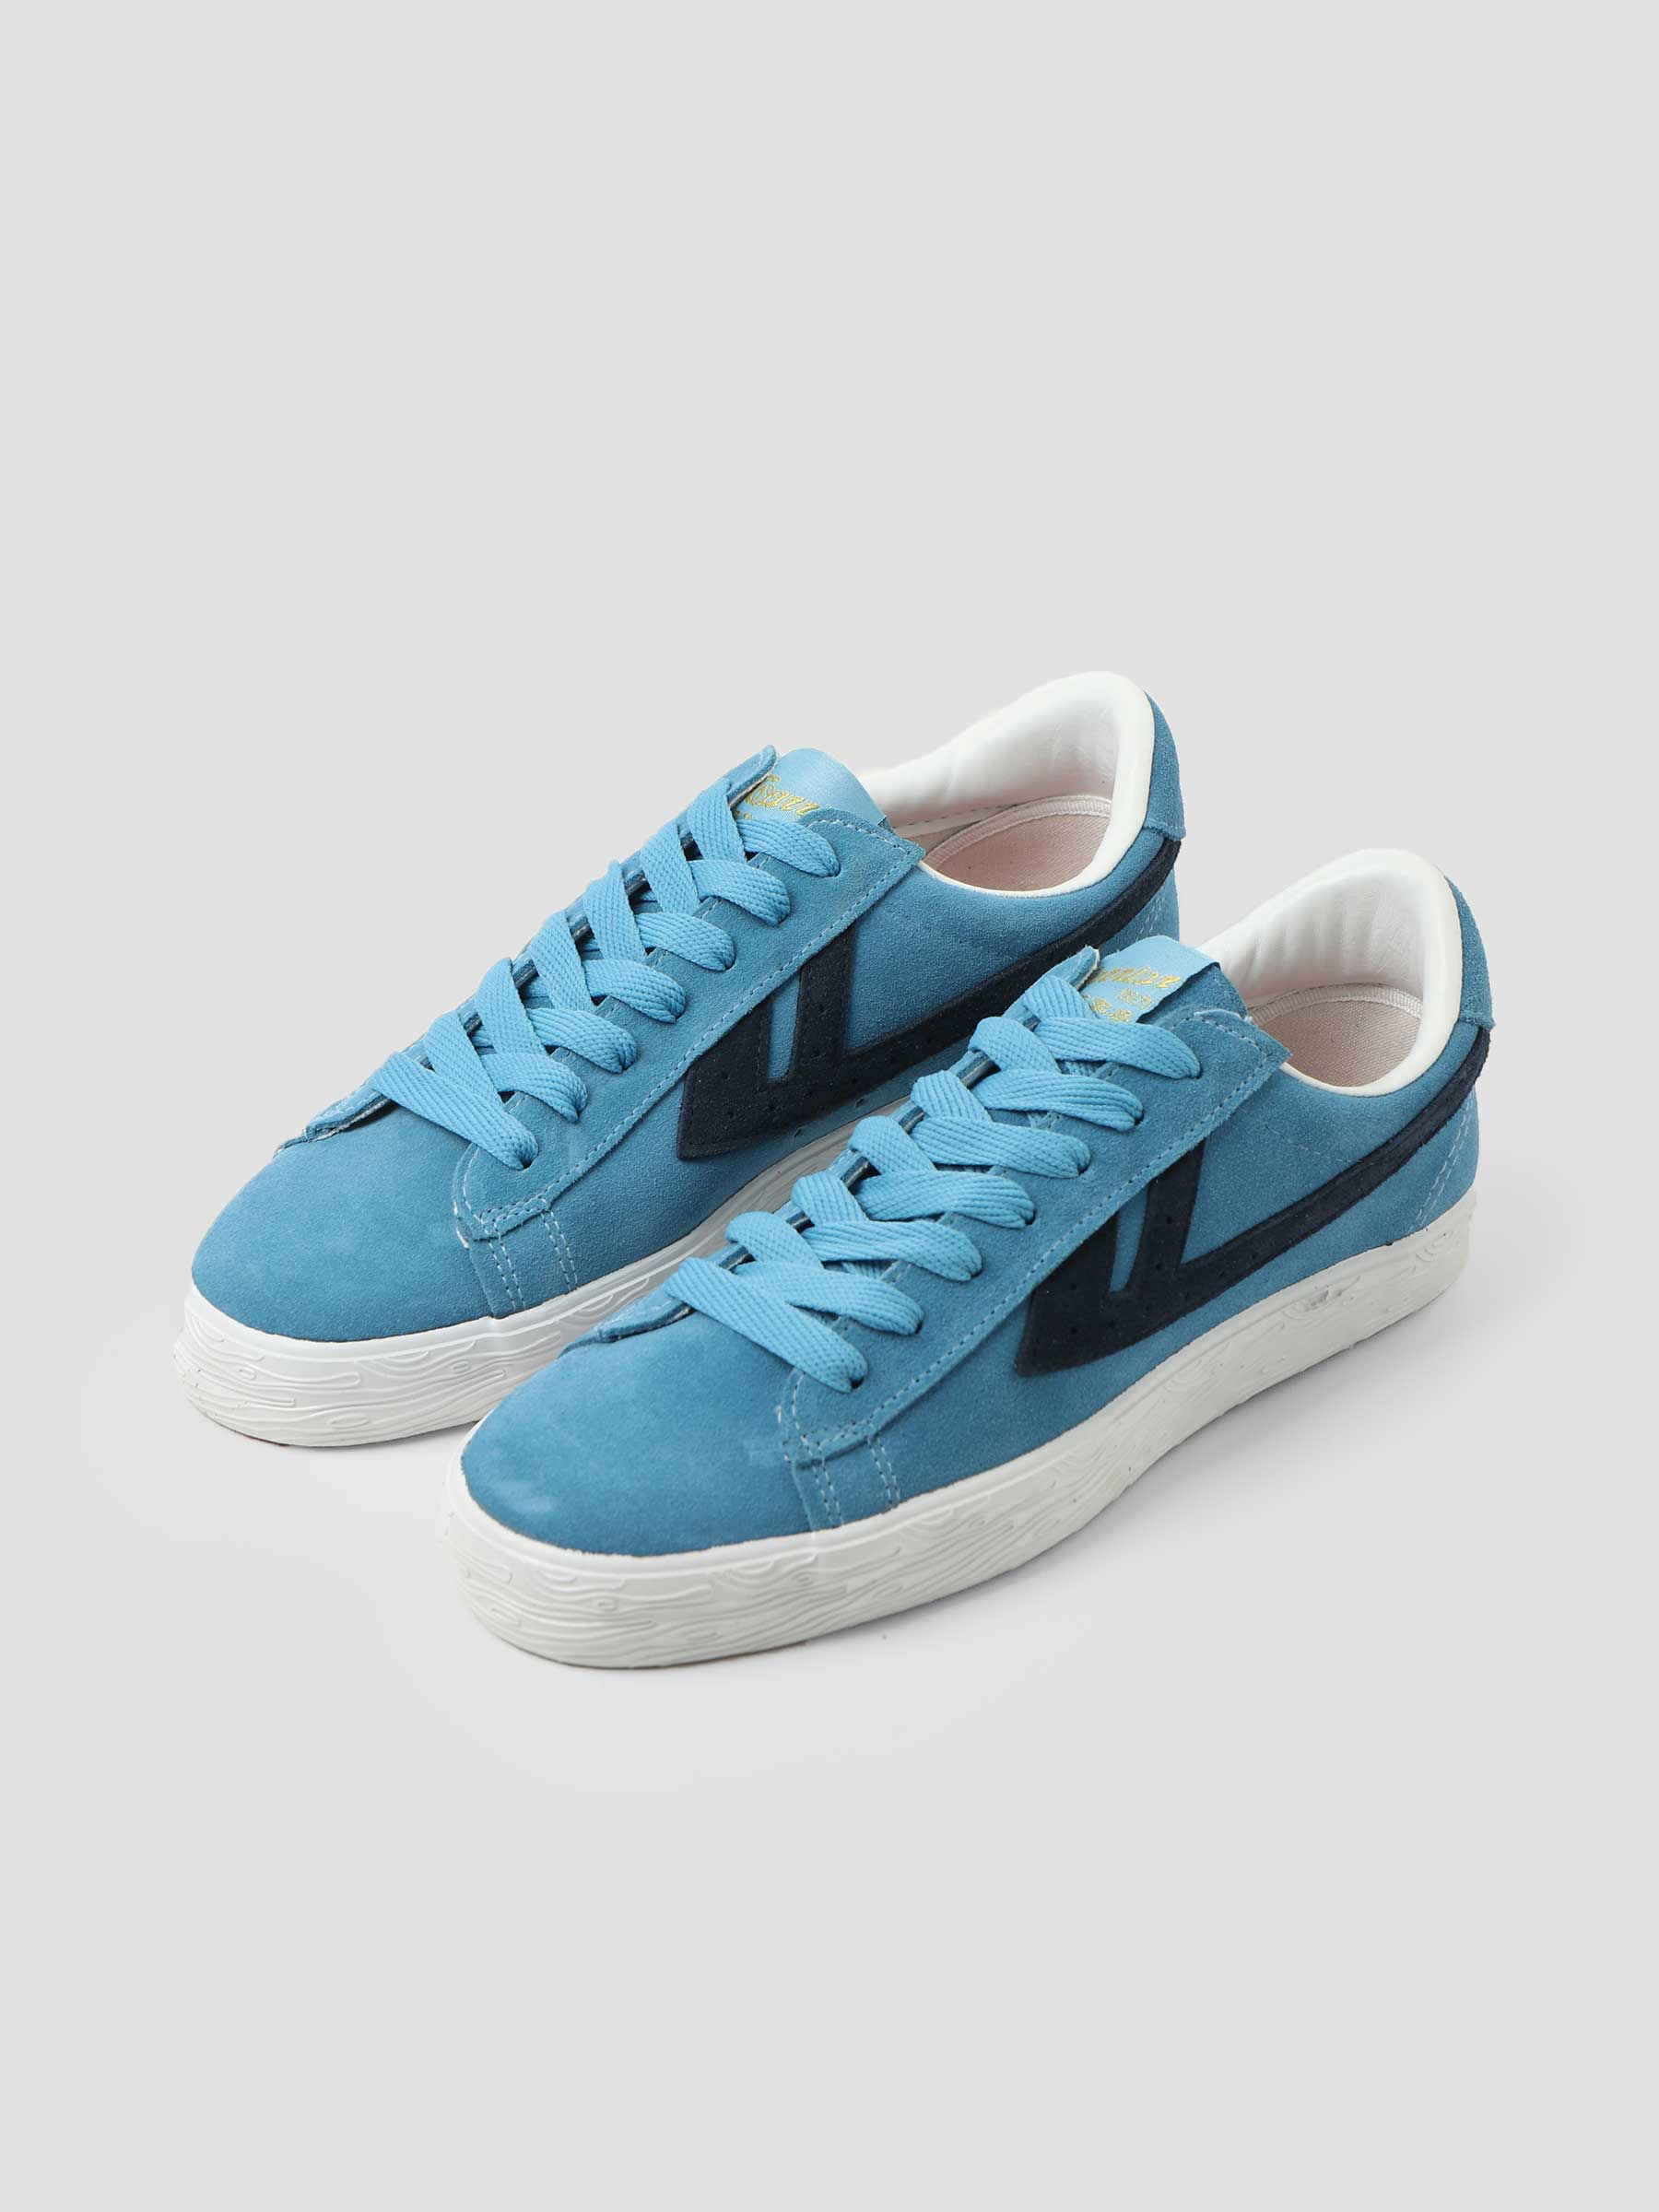 Dime Blue Navy